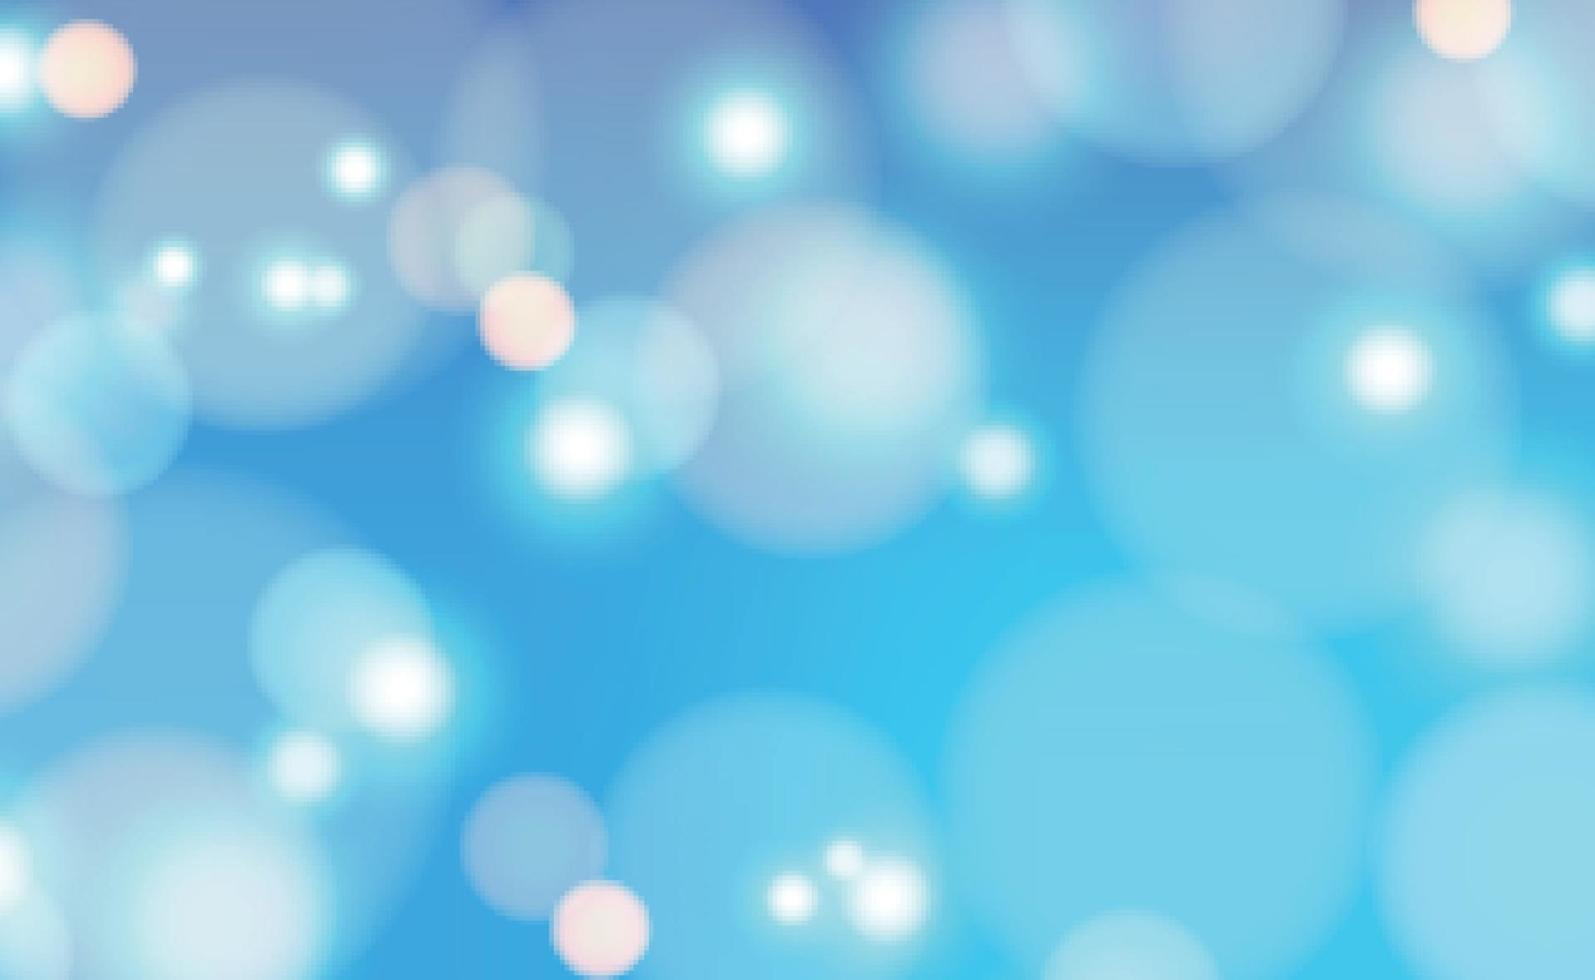 bokeh flou blanc sur fond bleu vecteur